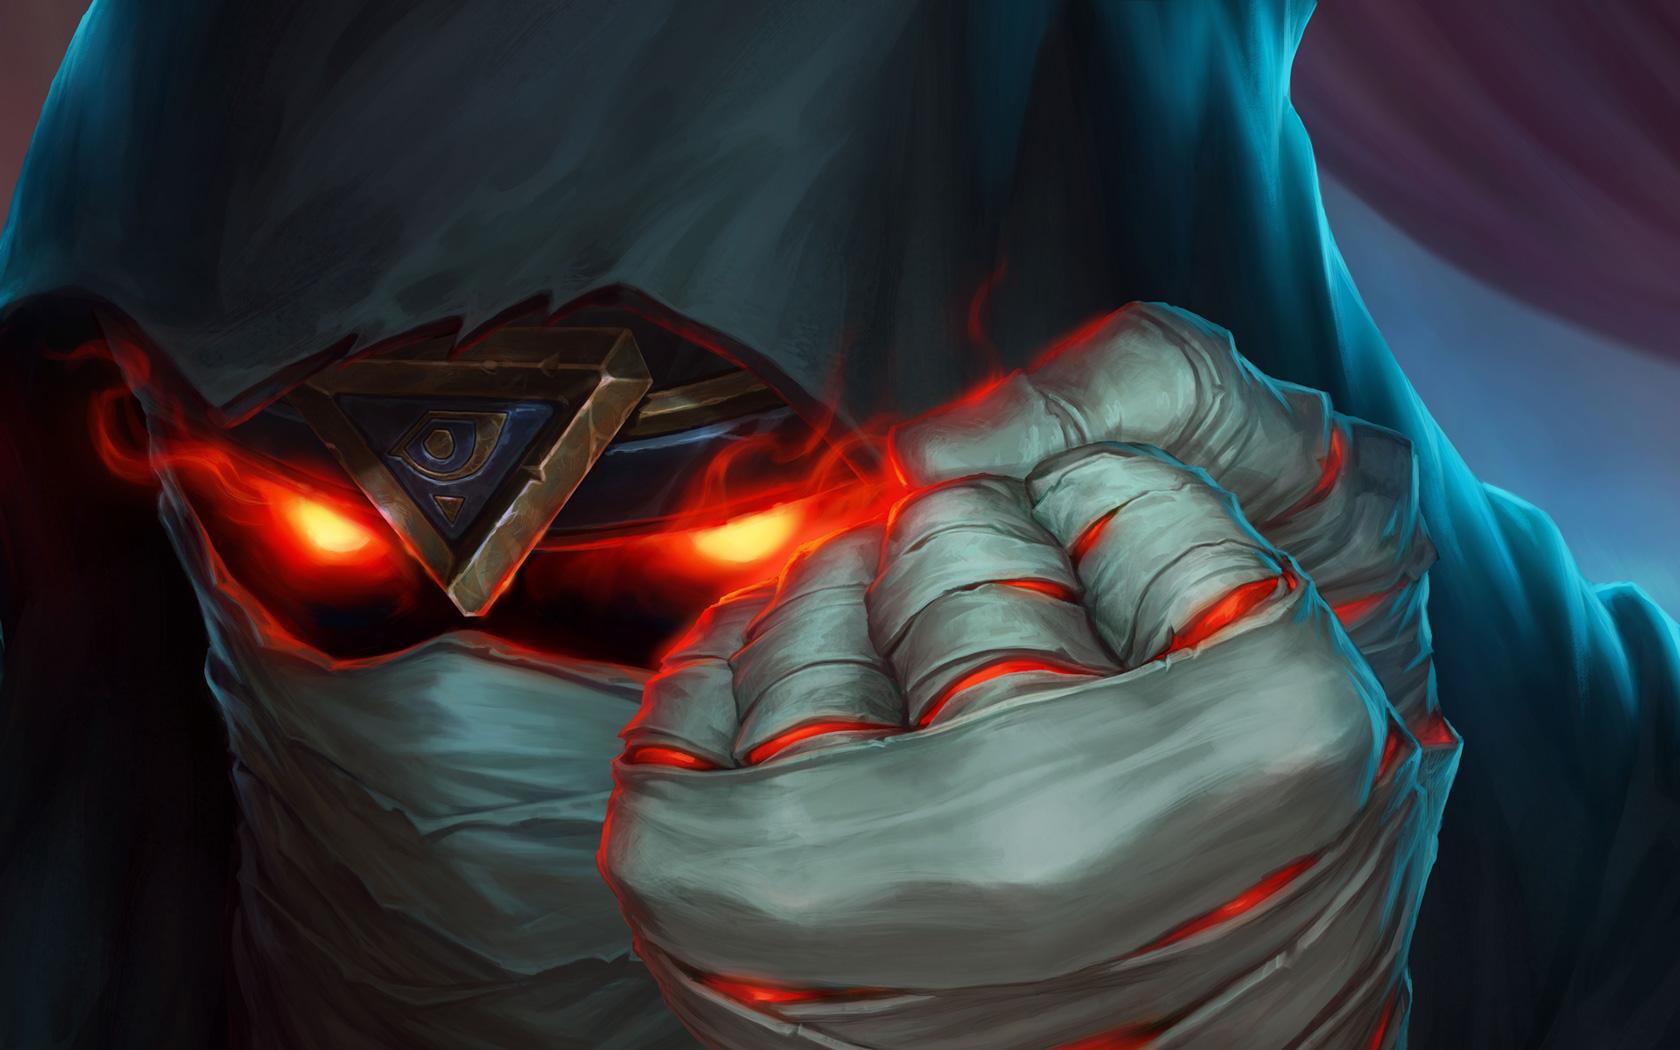 Free Hearthstone: Heroes of Warcraft Wallpaper in 1680x1050